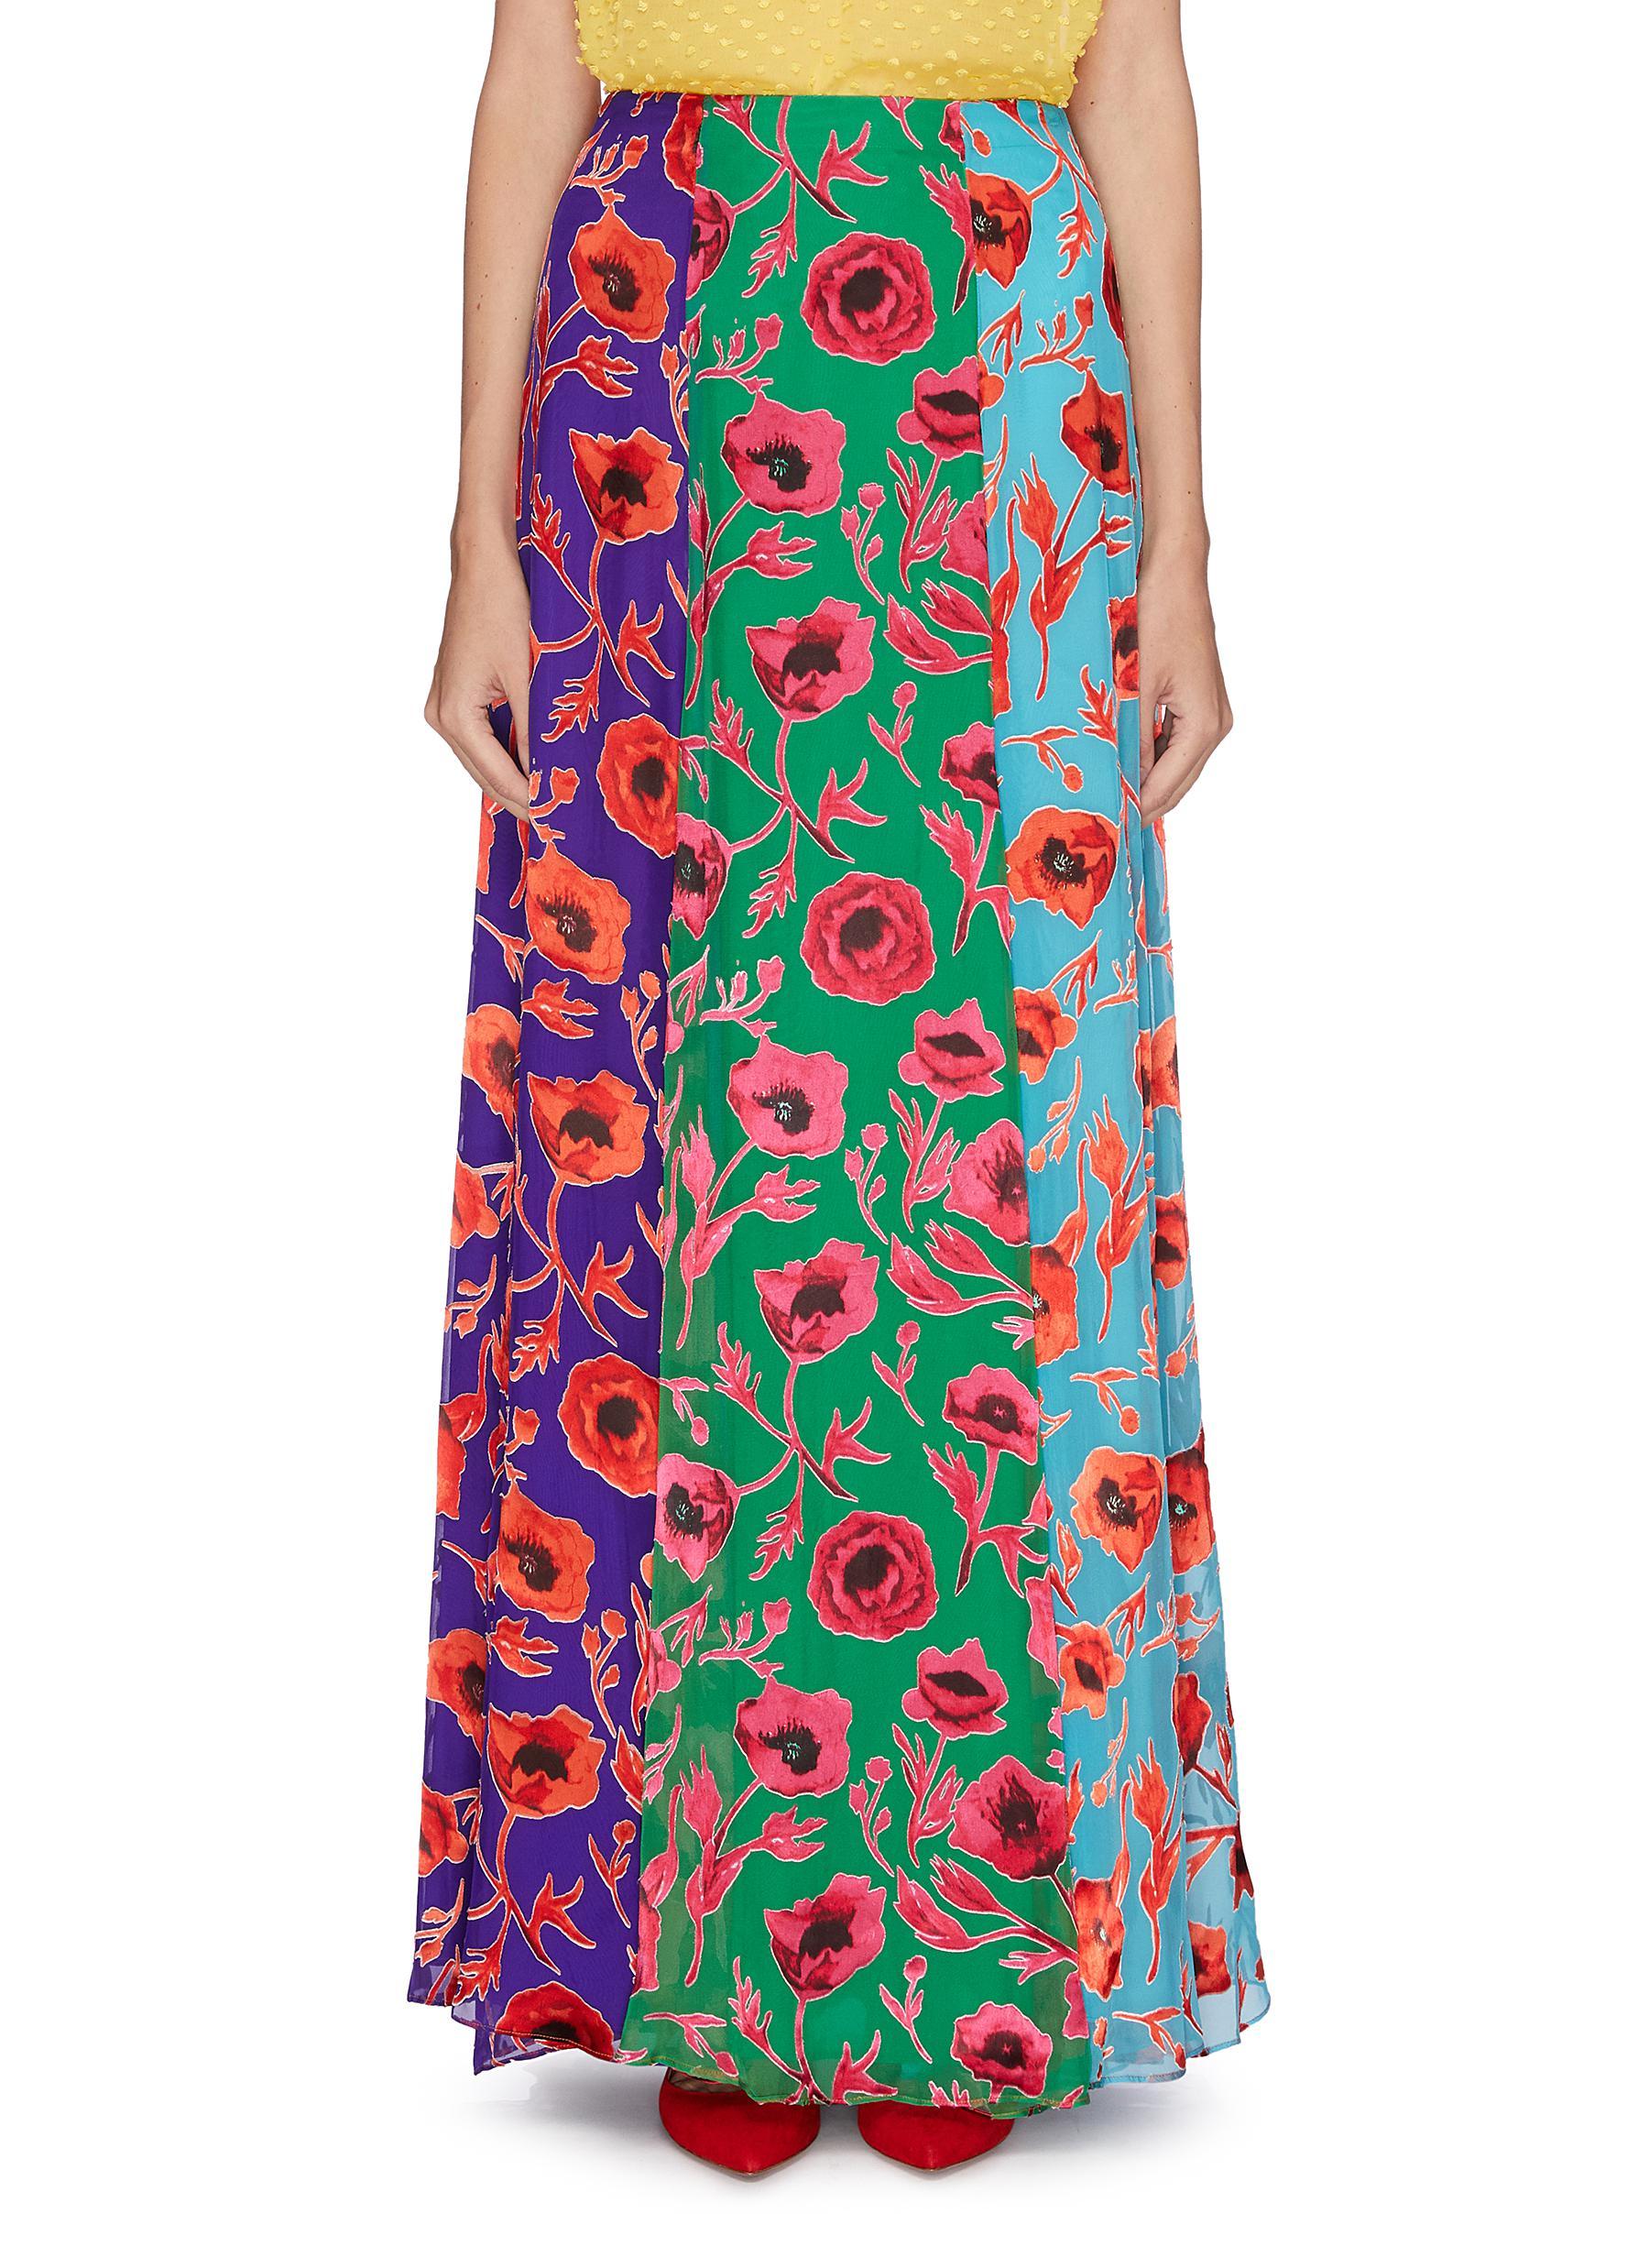 Aquinnah floral print panelled colourblock skirt by Alice + Olivia